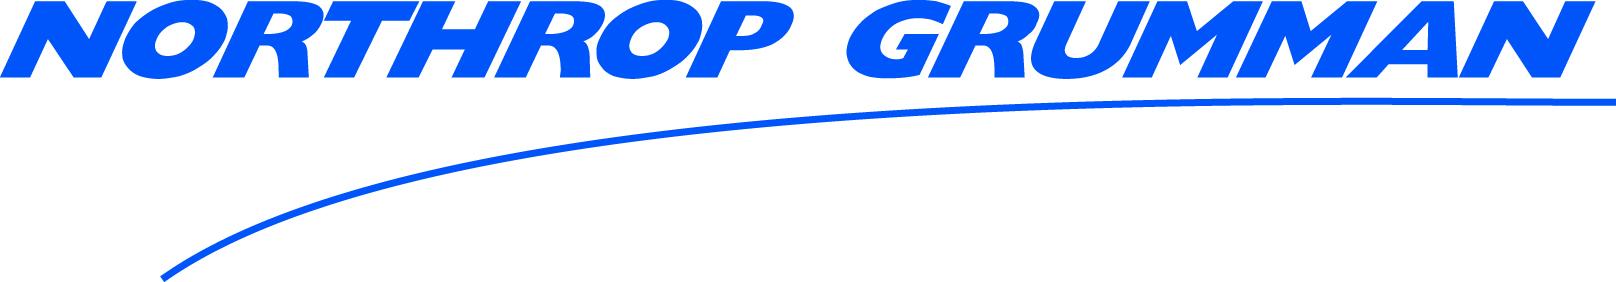 Northrup Grumman (NGIS)